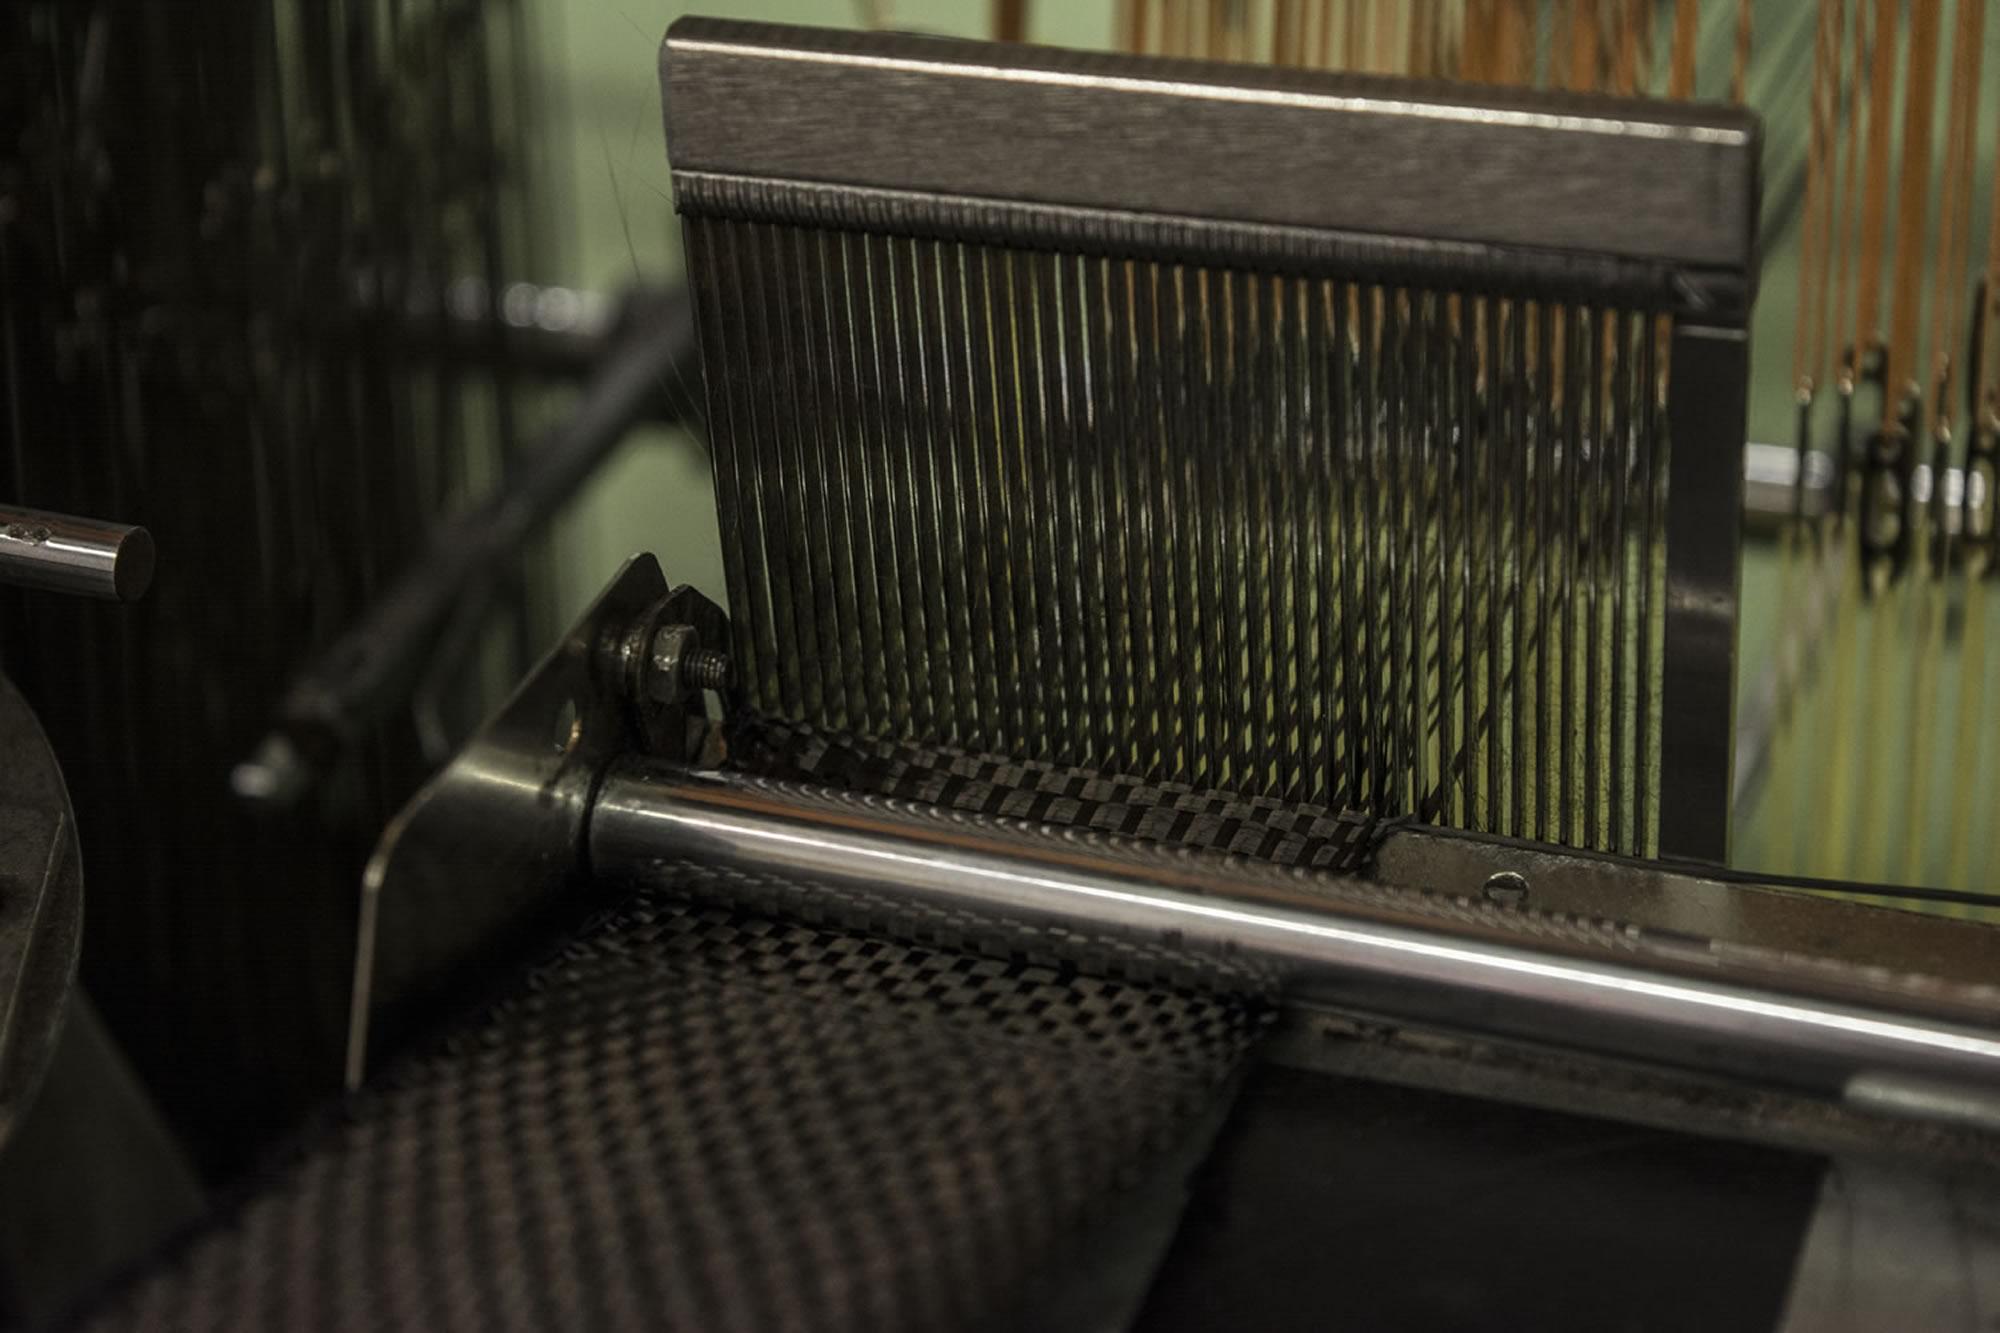 Weaving Carbon Fibre Webbing